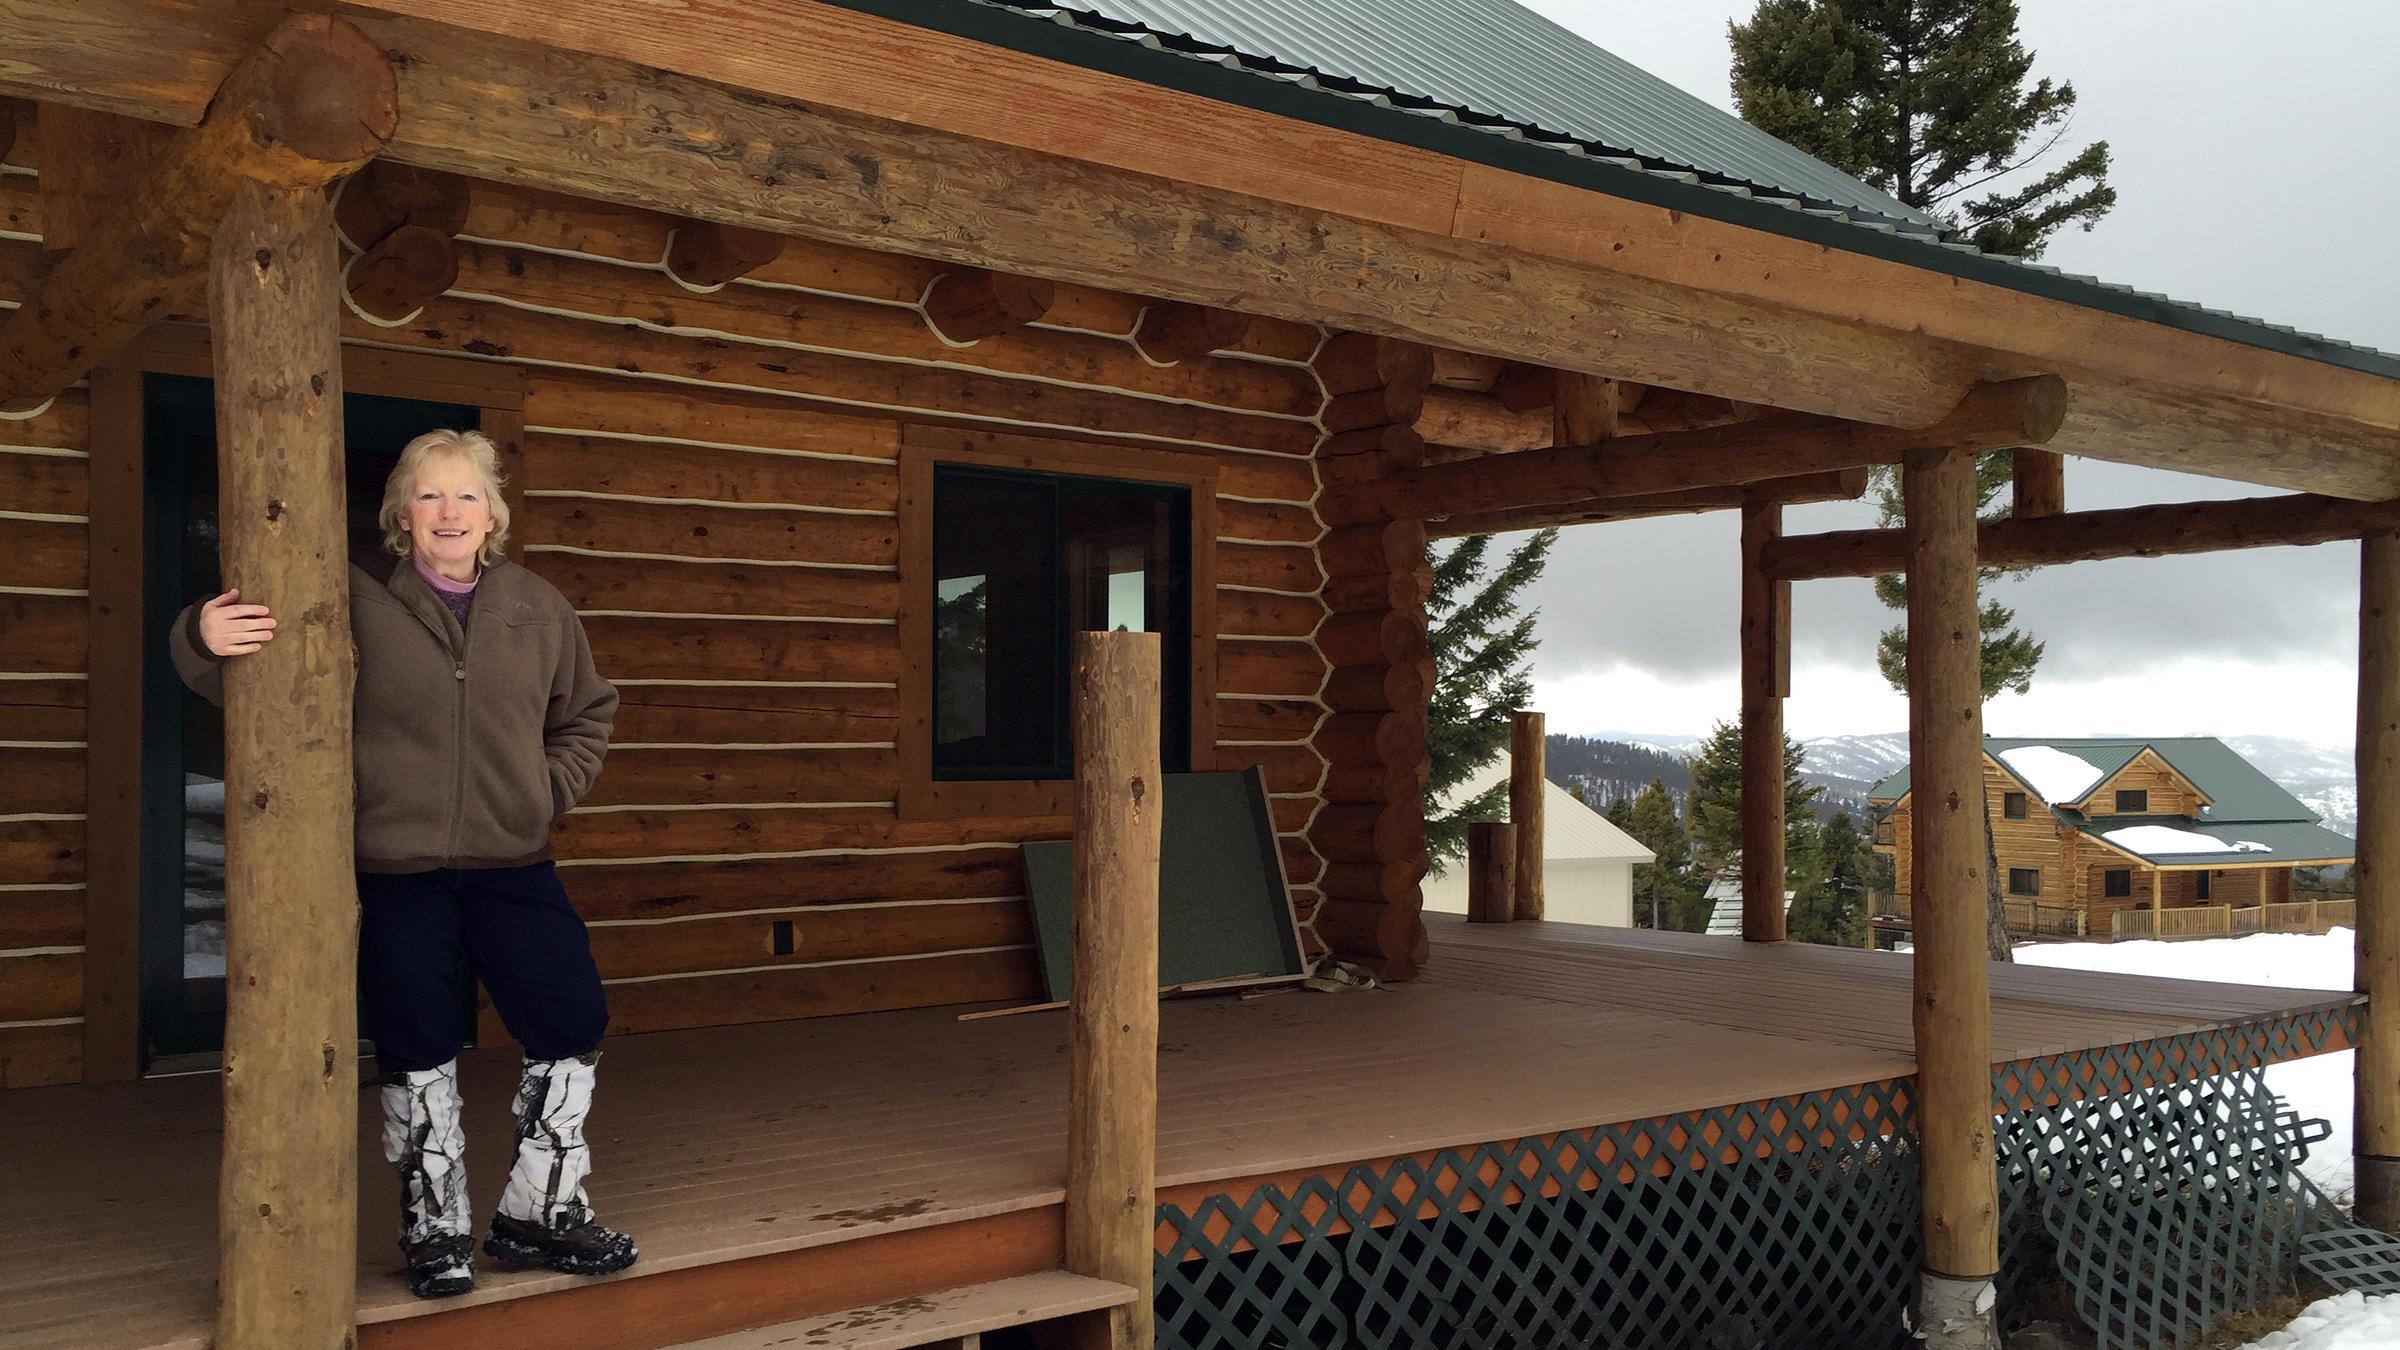 ^ In he ural Northwest,  Growing Market For Survivalist Homes ...